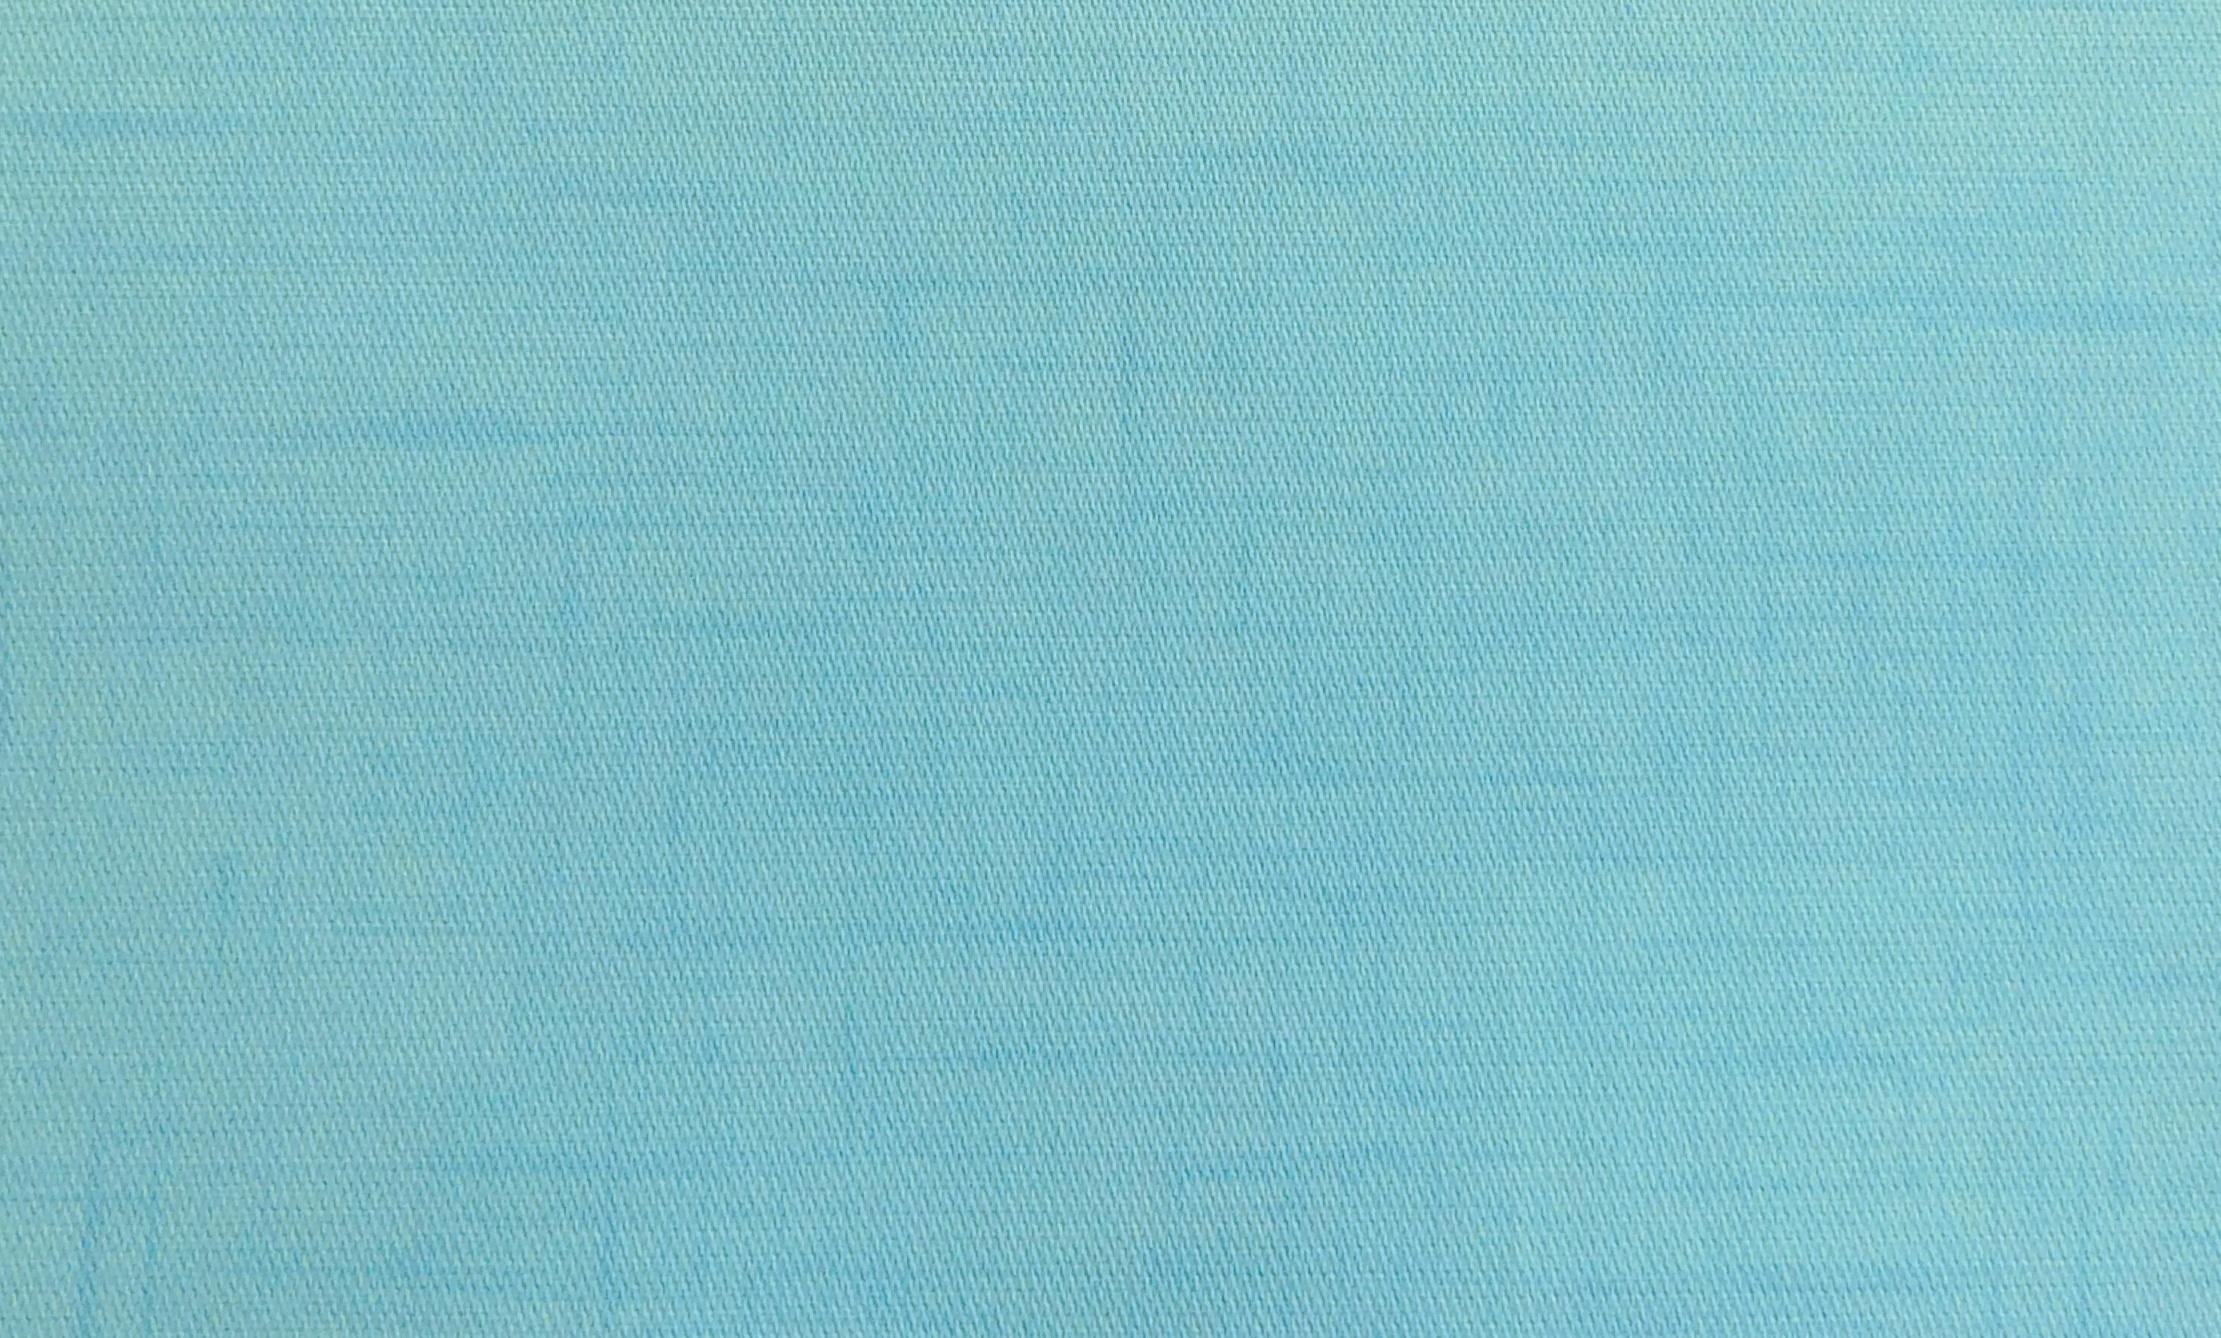 Spectrum Soft Blue Blind Fabric RA